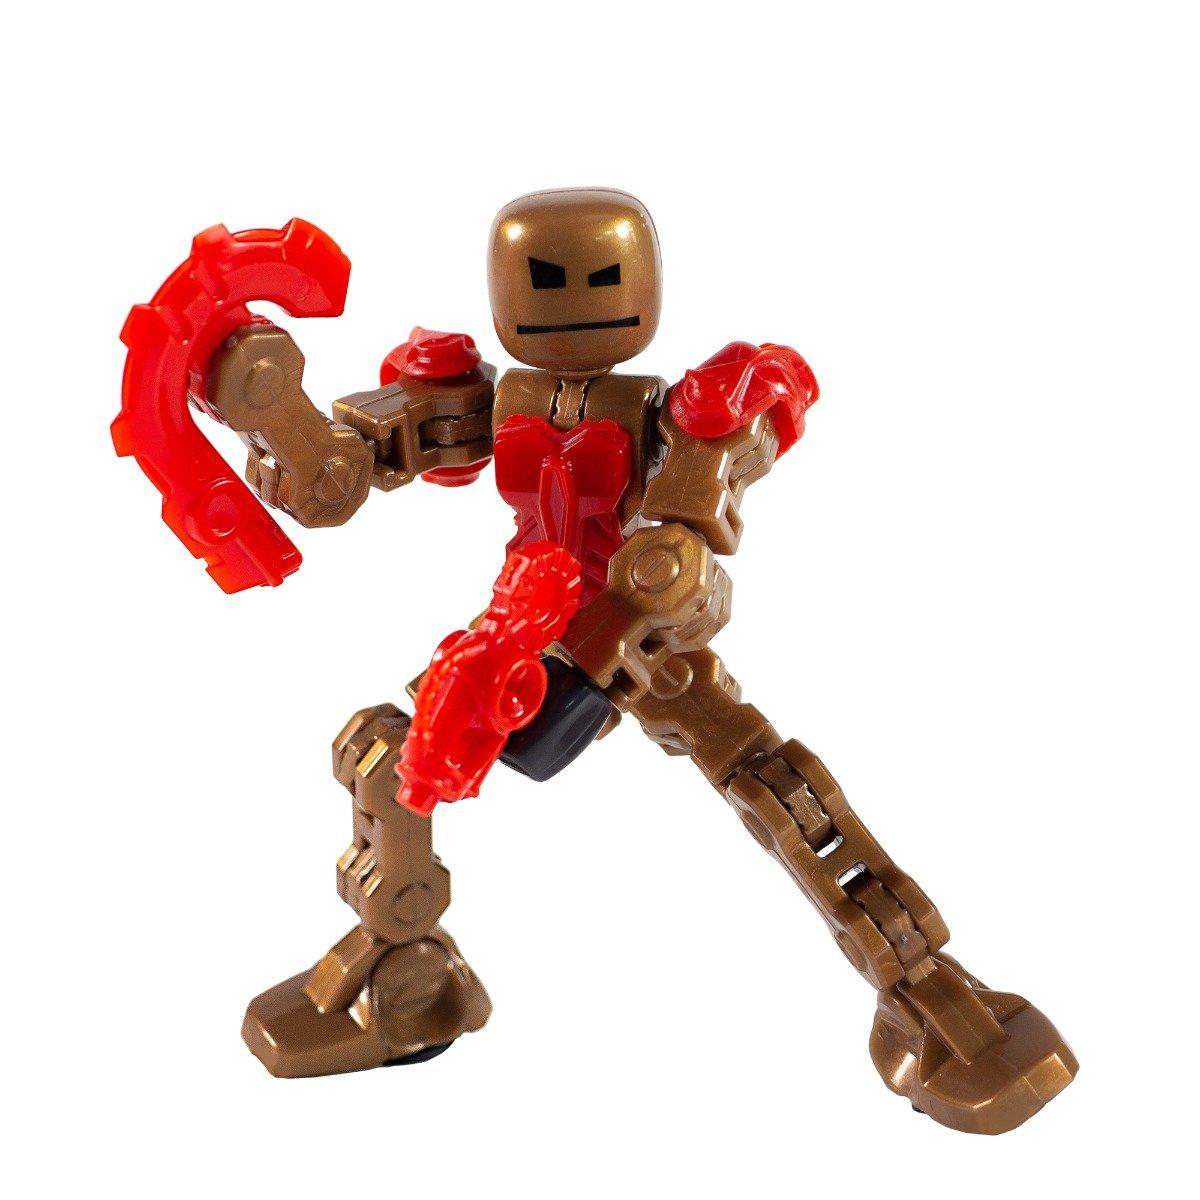 Figurina Robot articulat transformabil KlikBot, Blaze